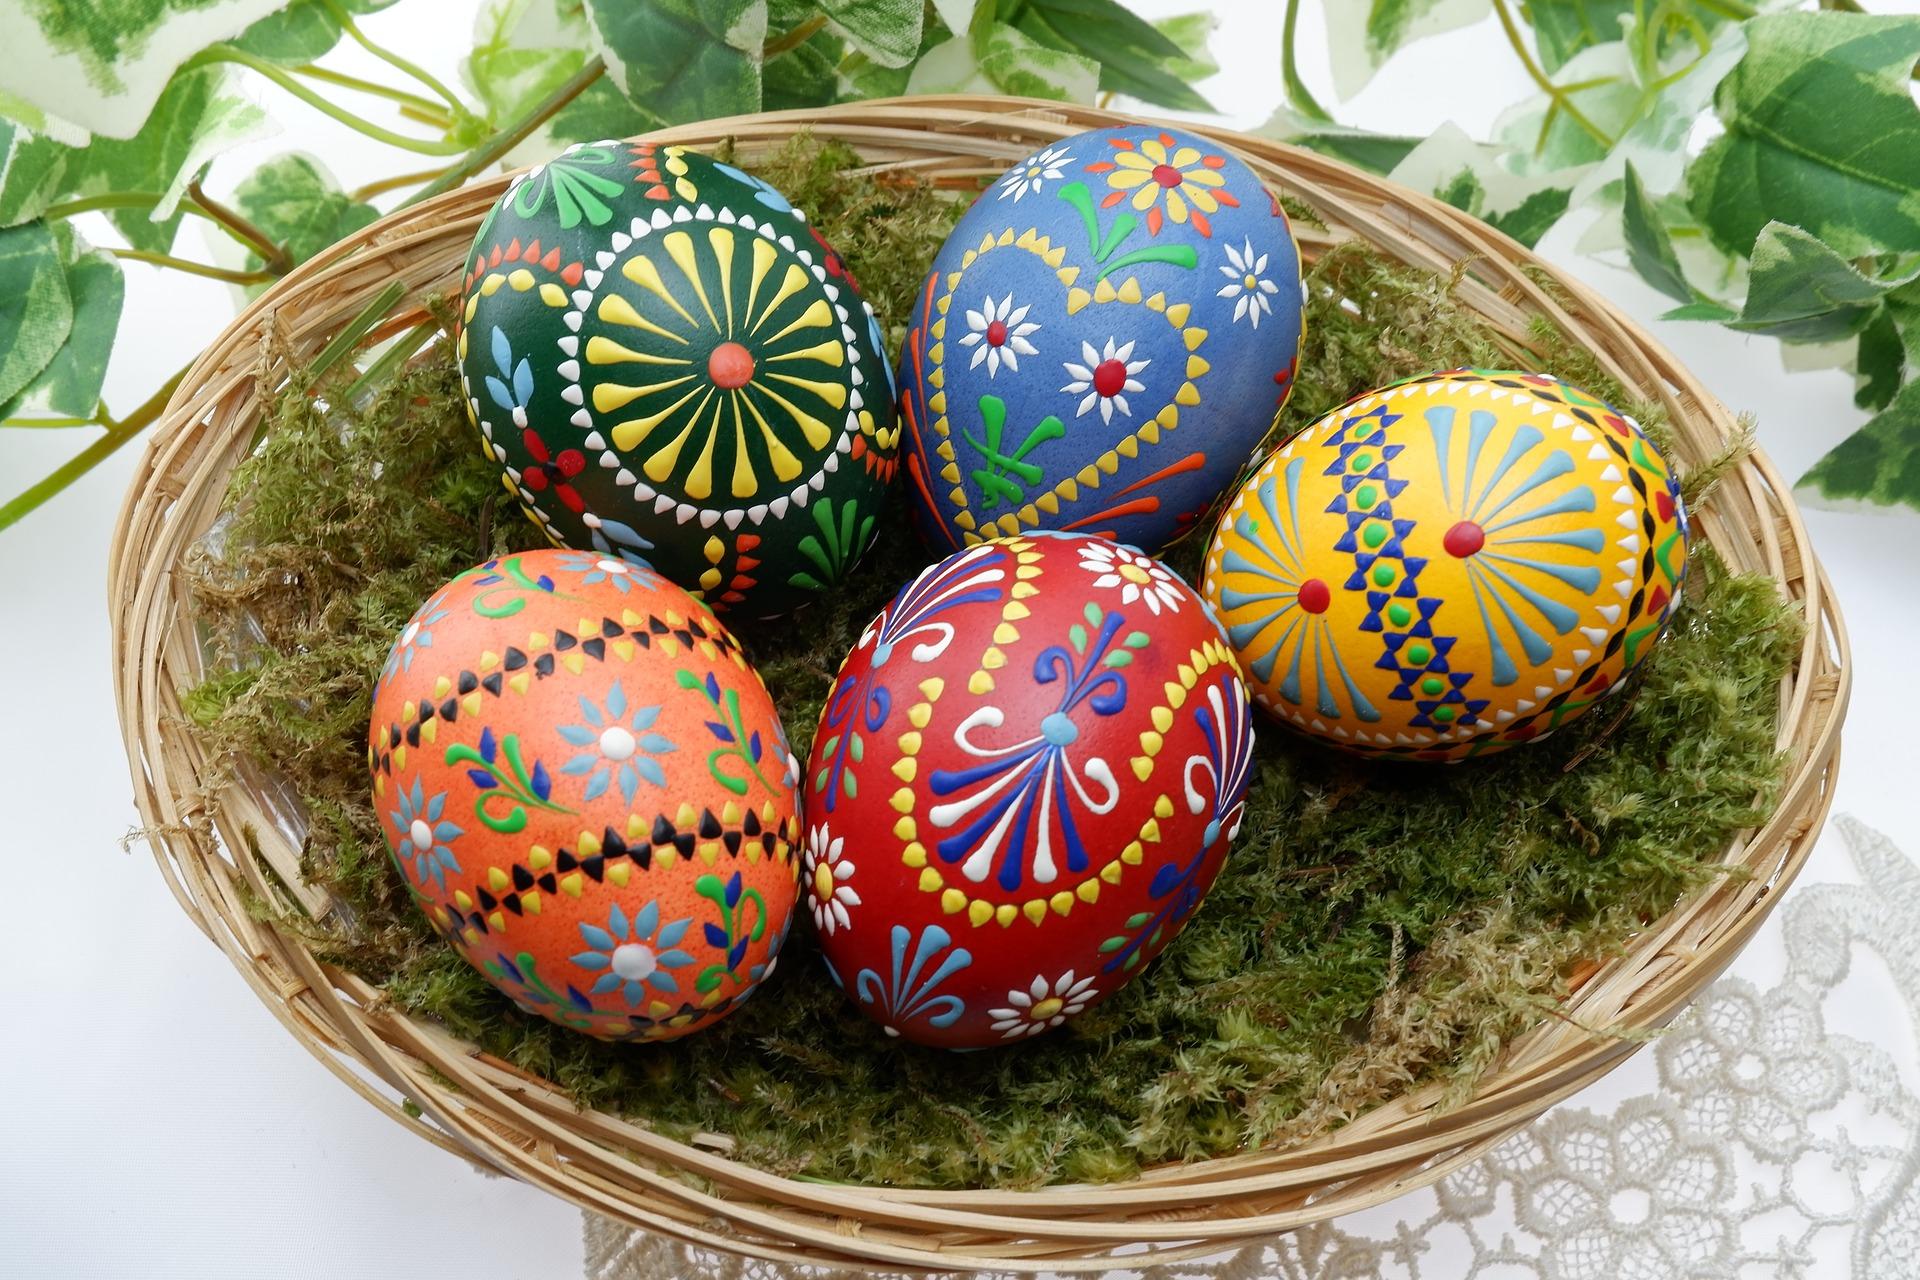 Huevos de Pascua, imprescindibles en el contexto de la Semana Santa